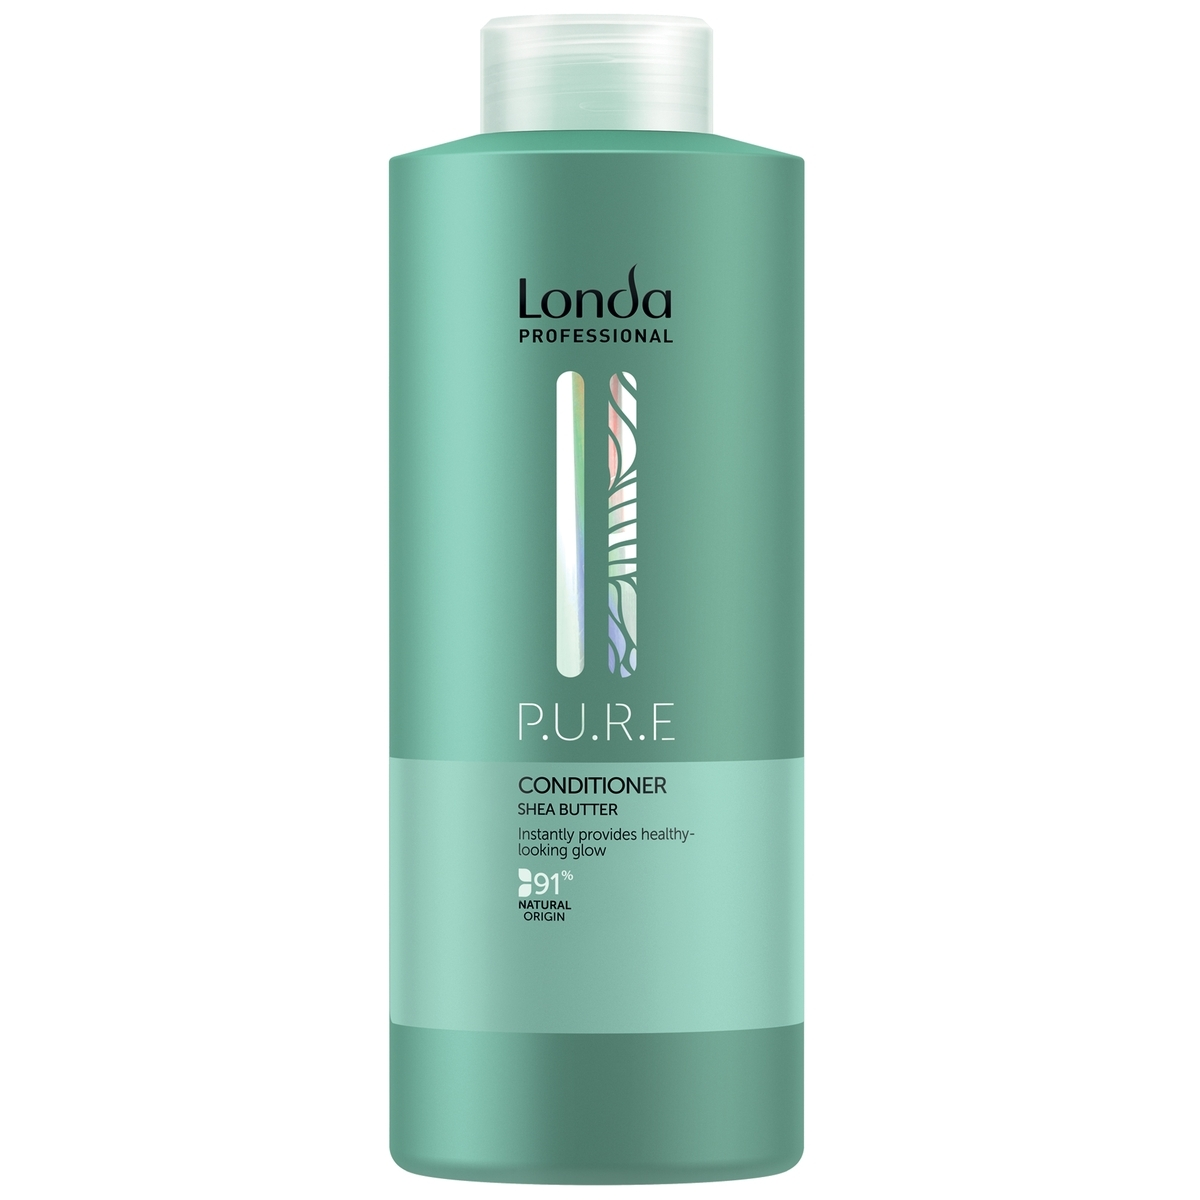 Кондиционер для волос Londa Professional P.U.R.E, 1000 мл